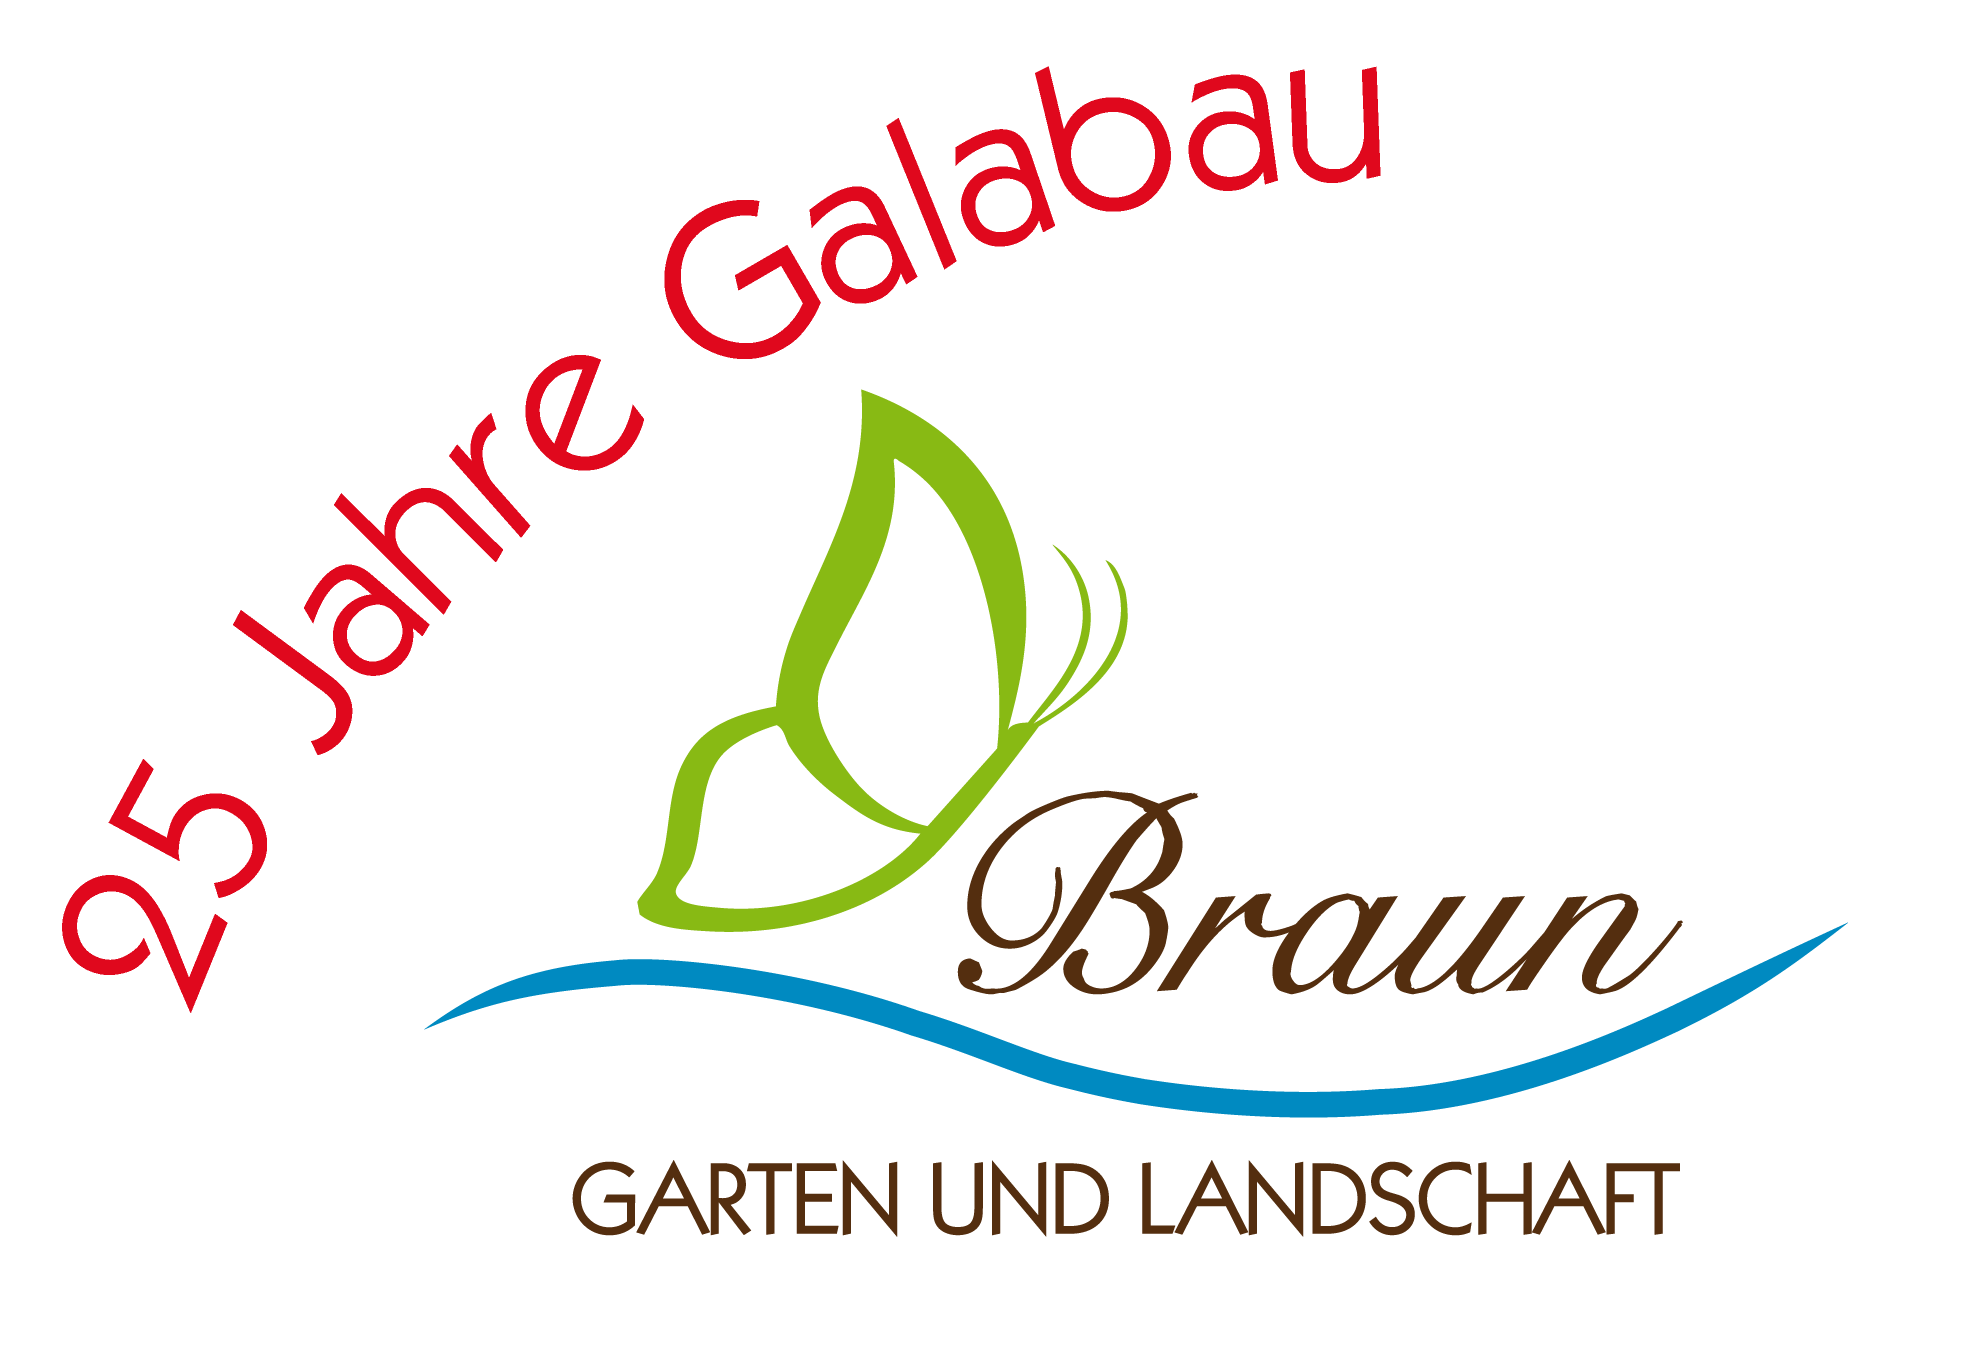 Gartenbau Braun